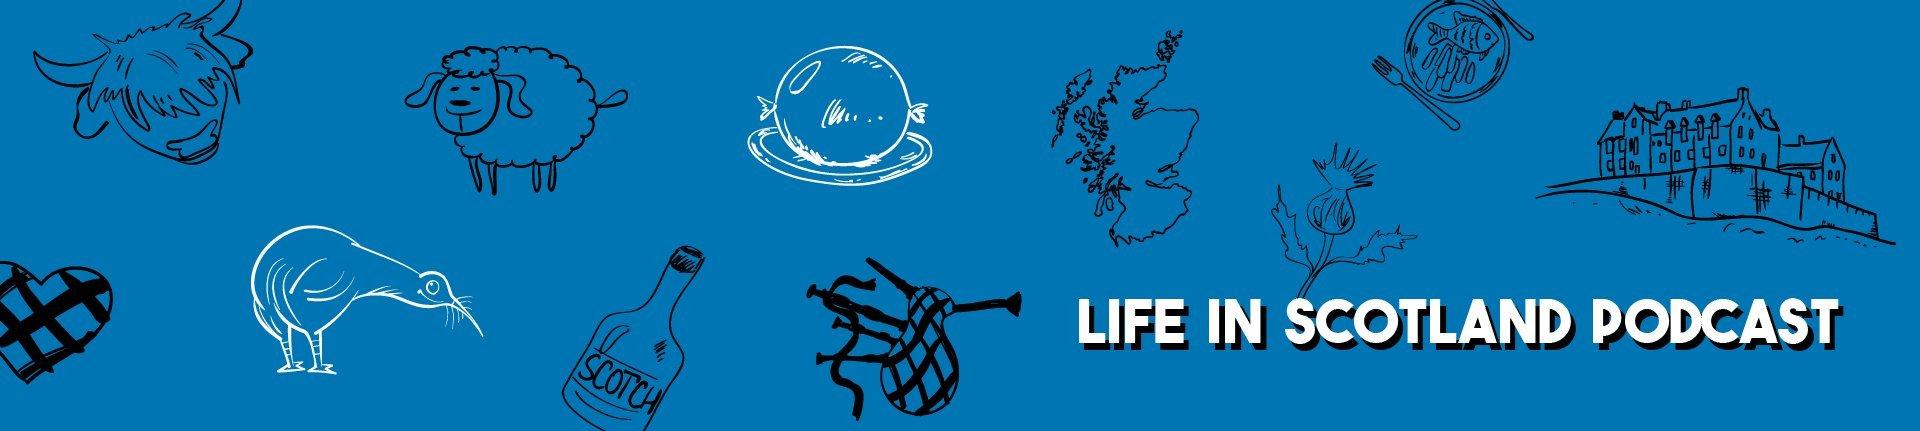 life in scotland podcast